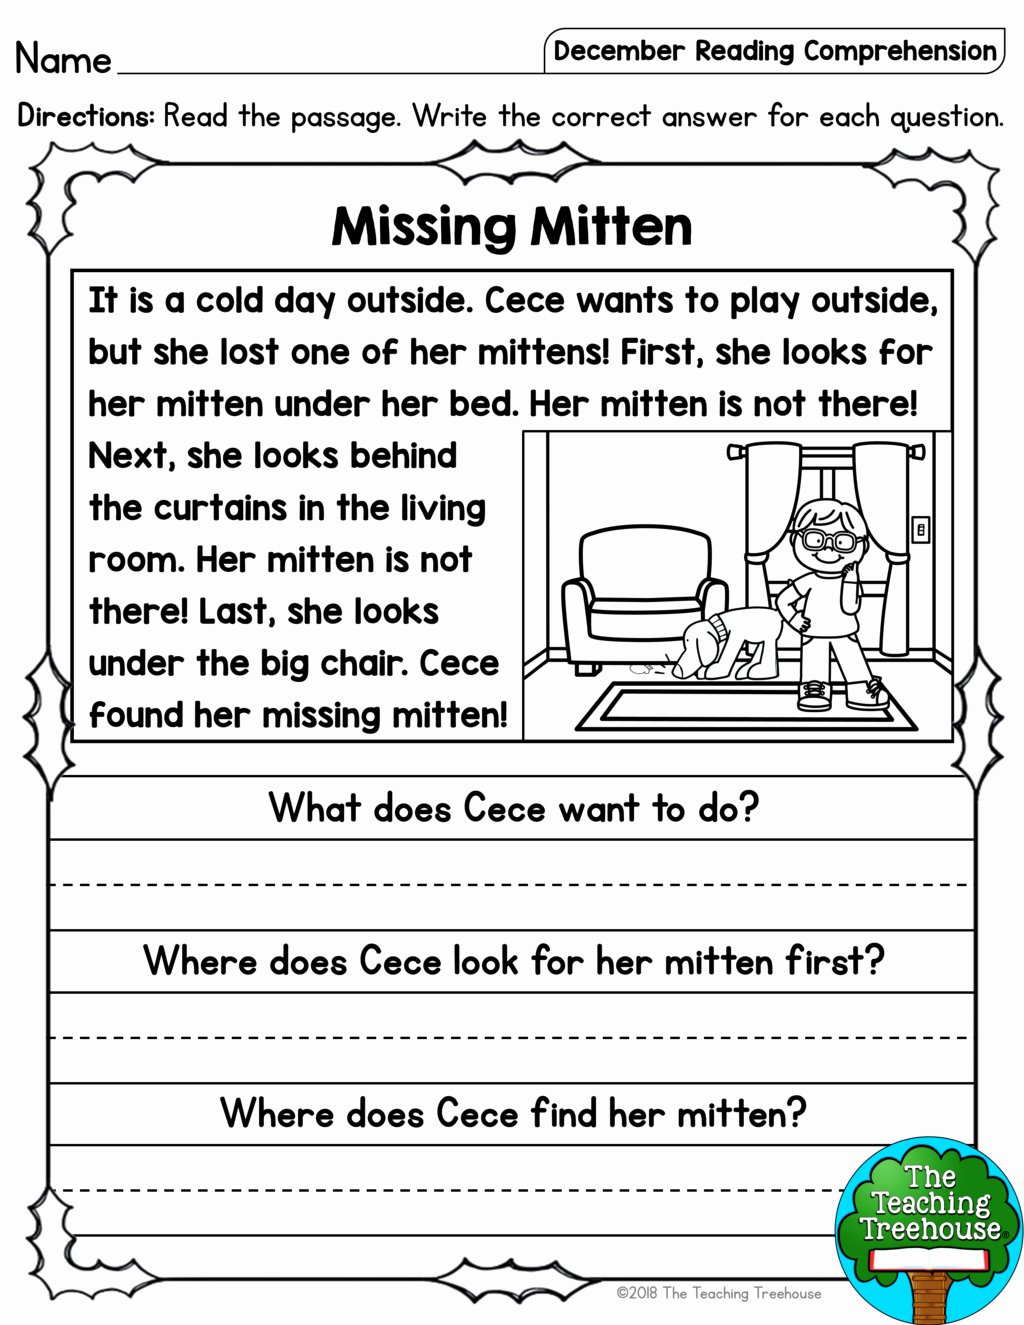 1st Grade Reading Worksheets Printable Elegant 1st Grade Reading Prehension Worksheets Multiple Choice